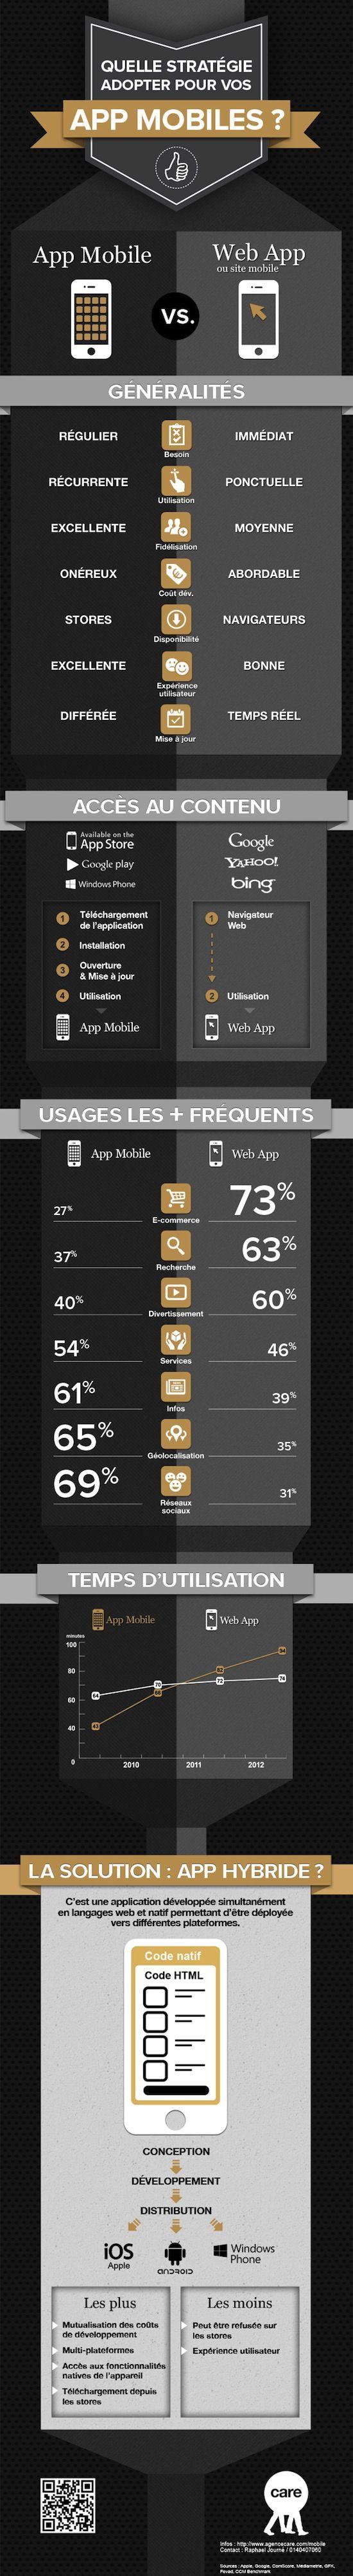 Stratégie mobile : Web app ou app mobile ? [infographie]